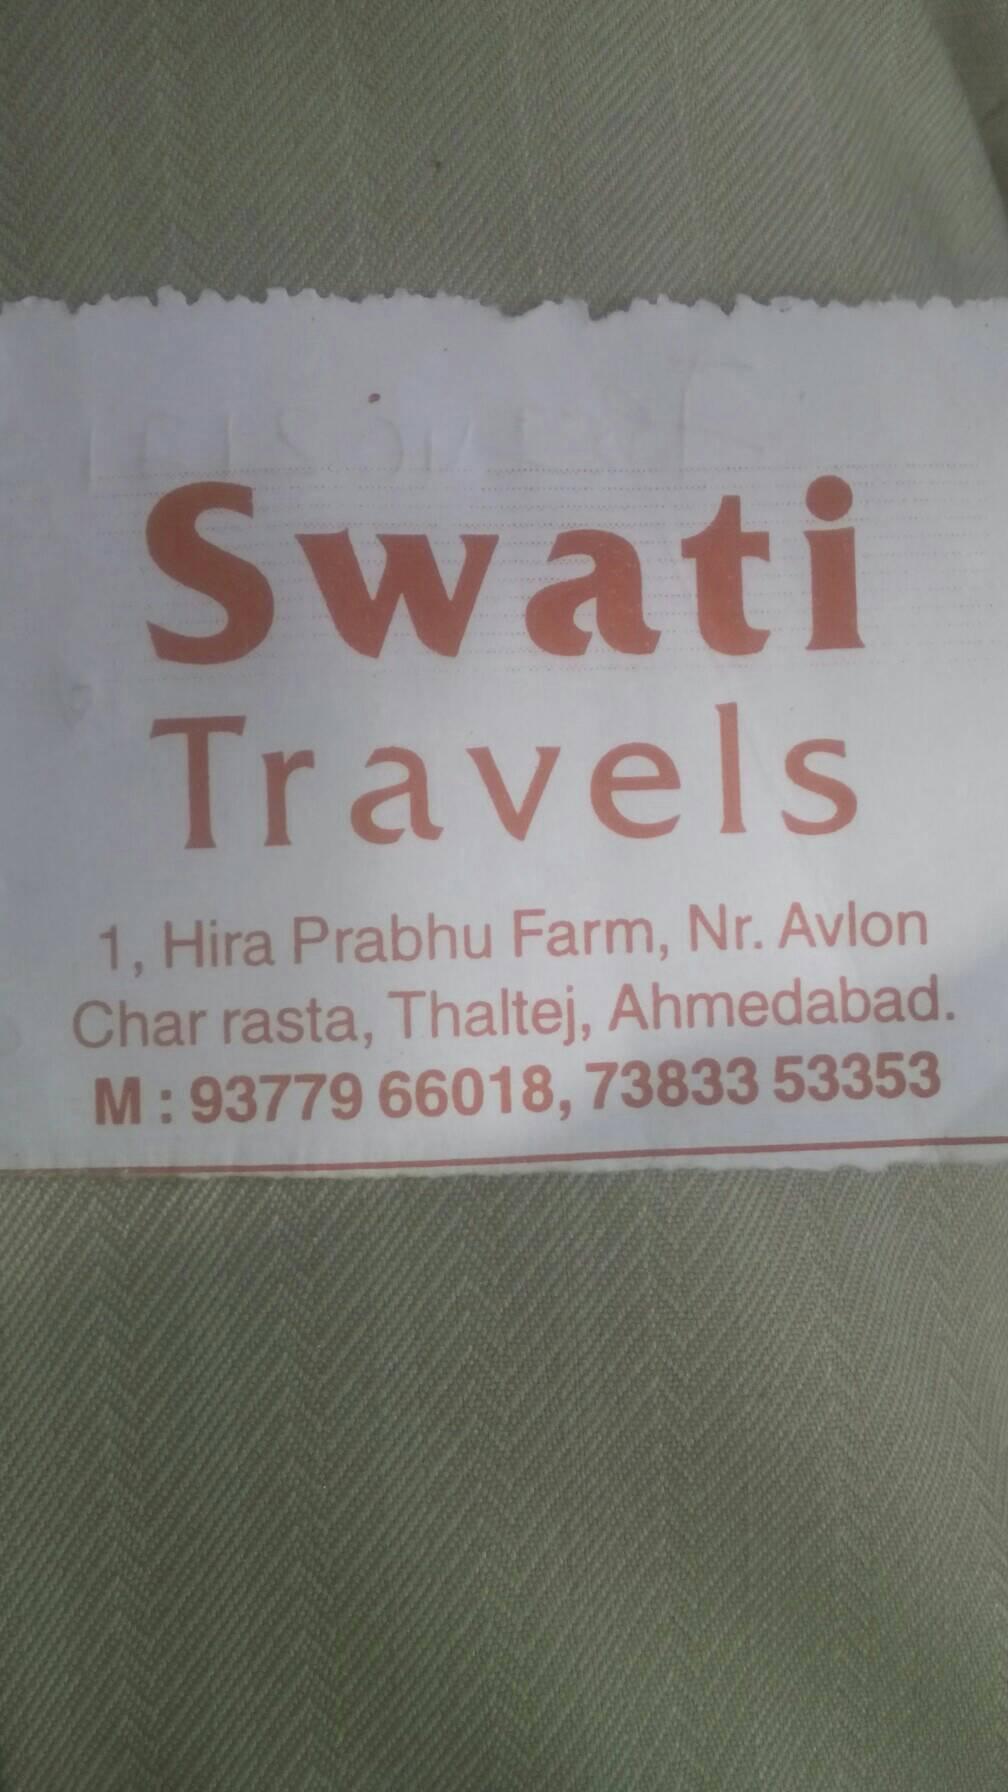 Swati Travels